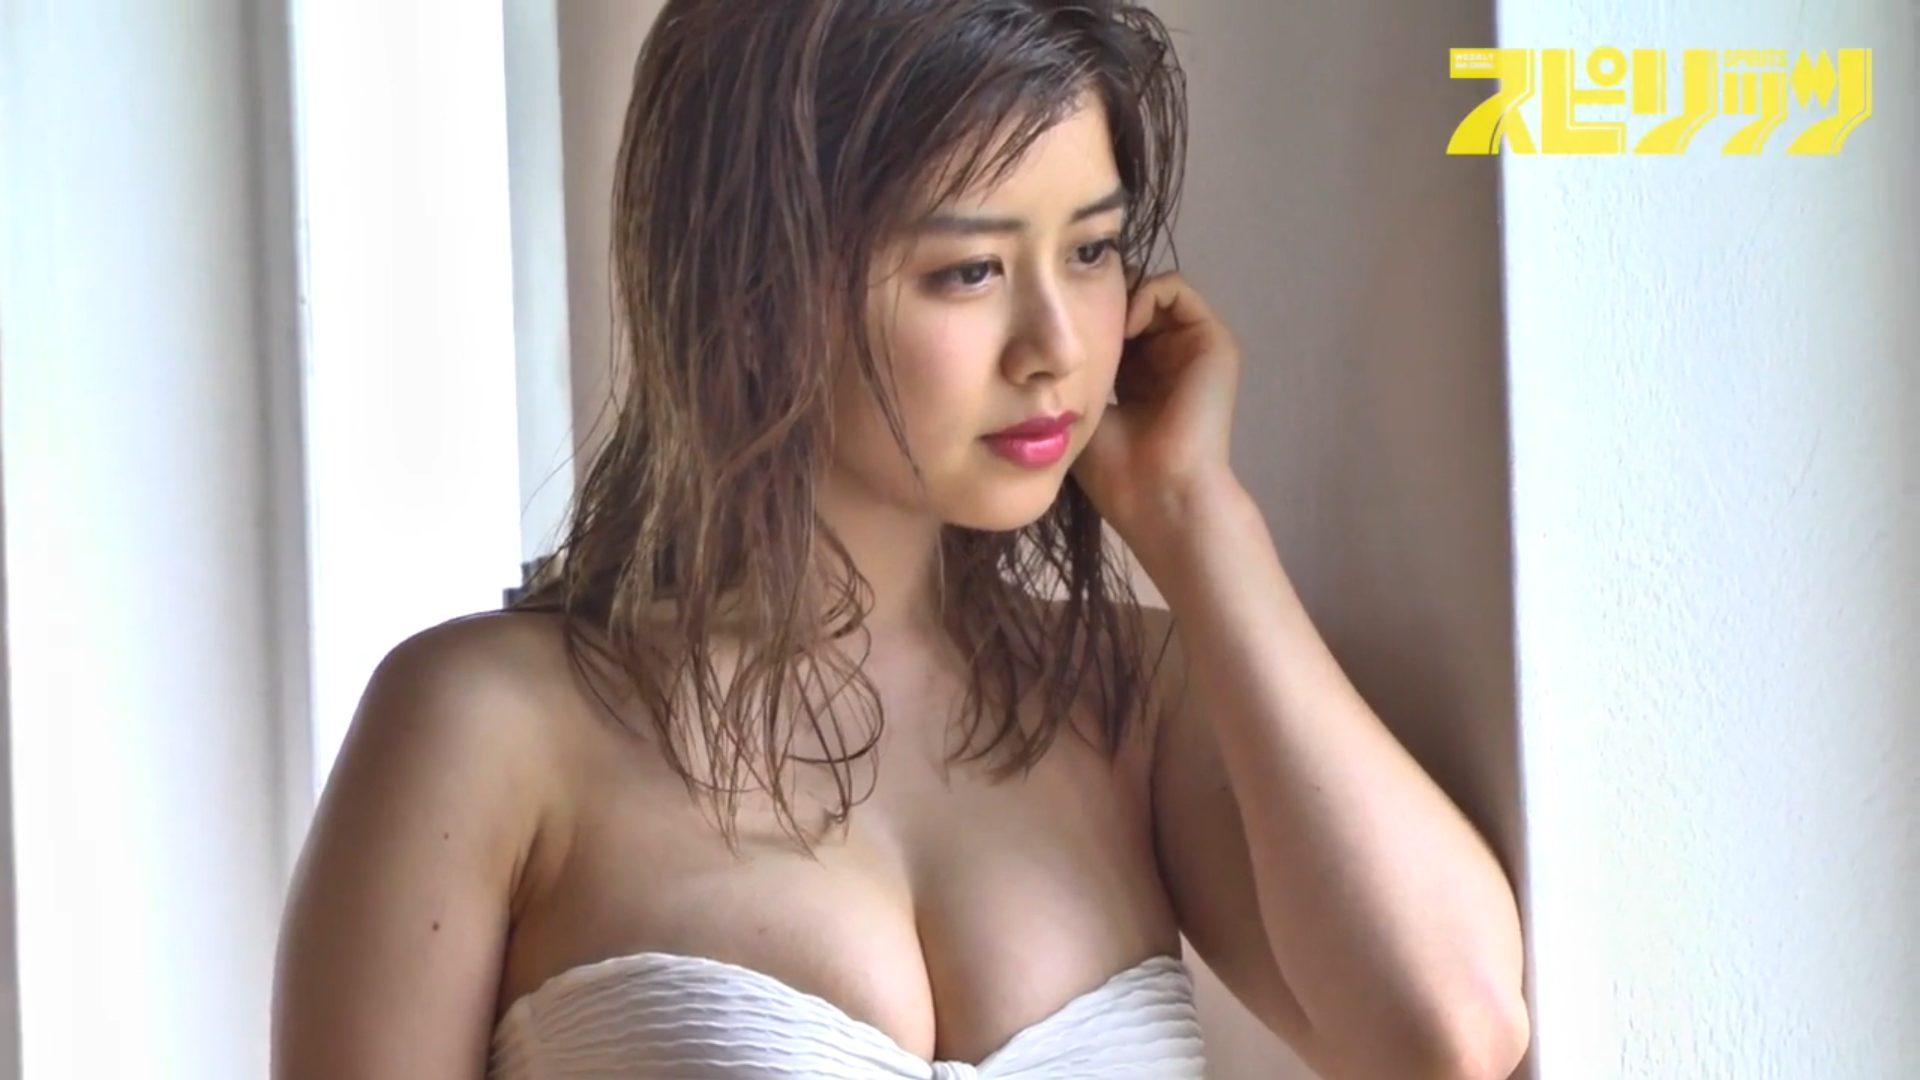 Gカップ 芸能人・タレント・グラビアアイドル動画一覧